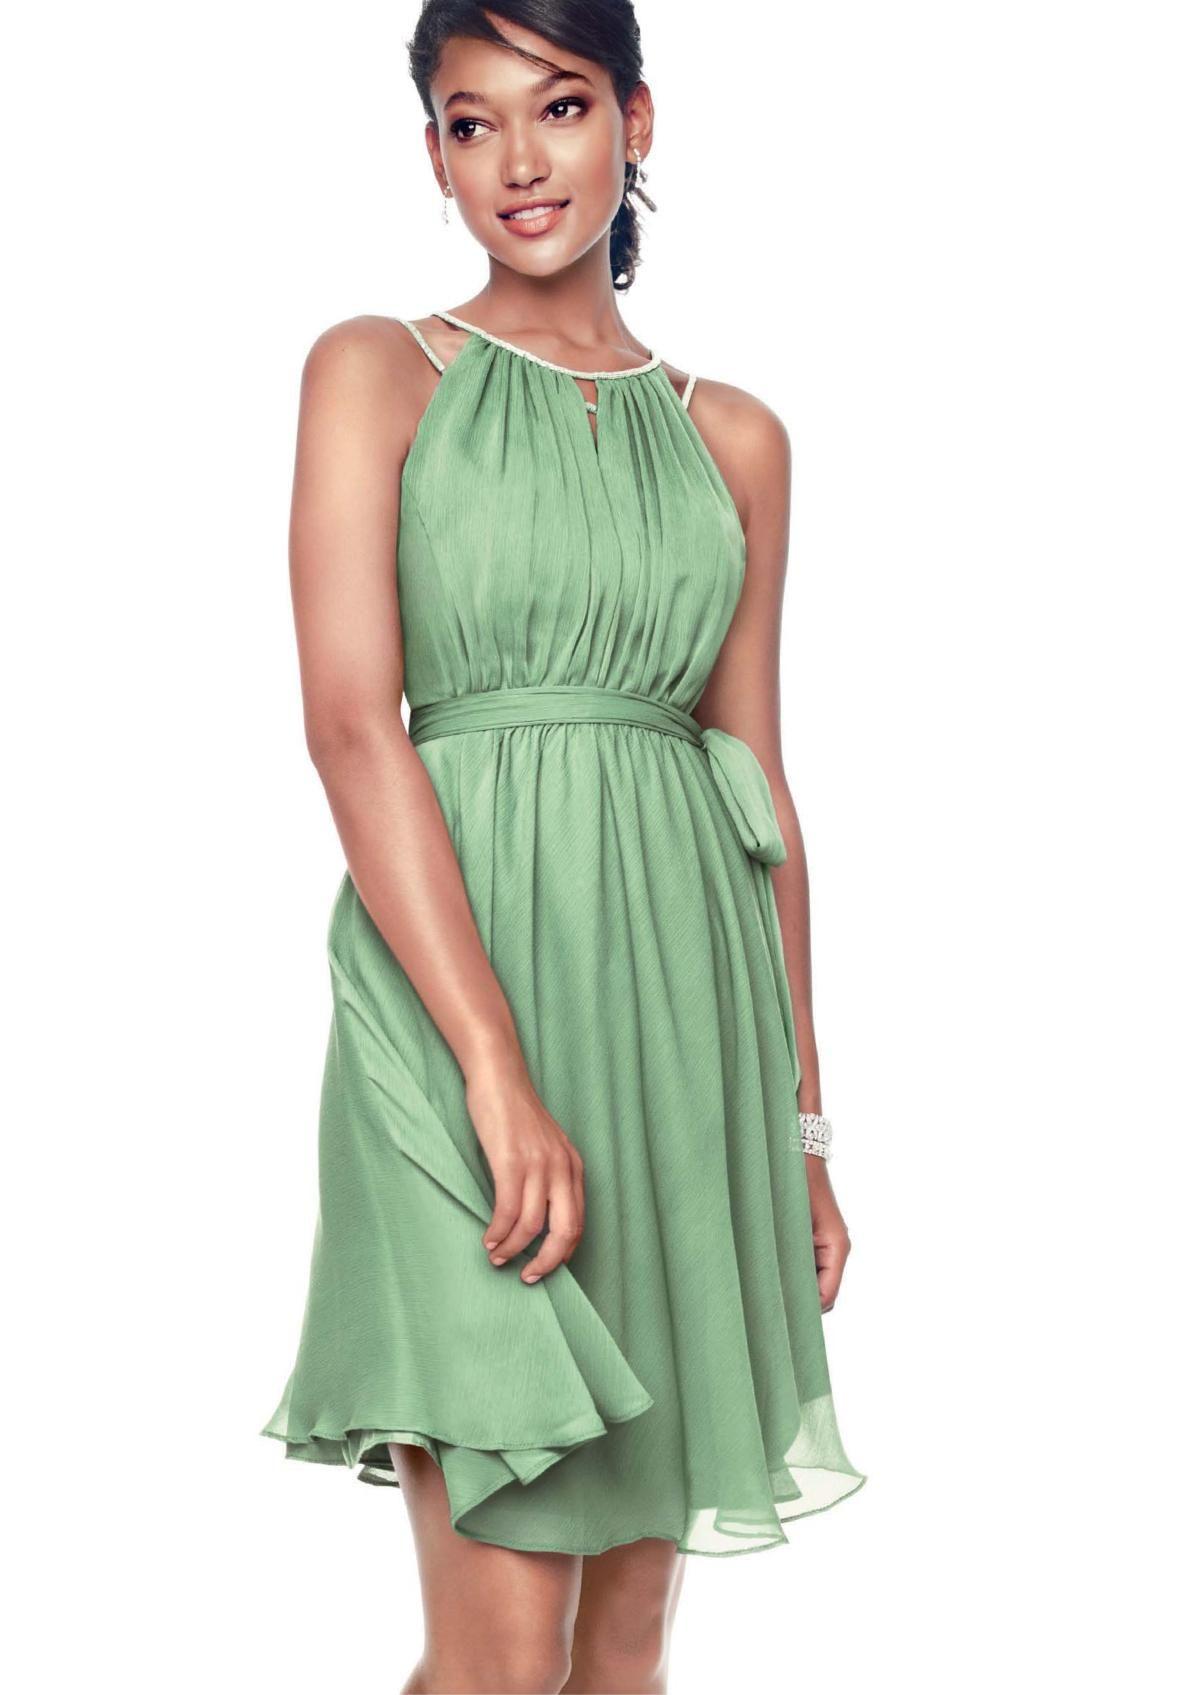 Green short dress for wedding  Davidus Bridal Online Catalog  Bridesmaids  Pinterest  Weddings